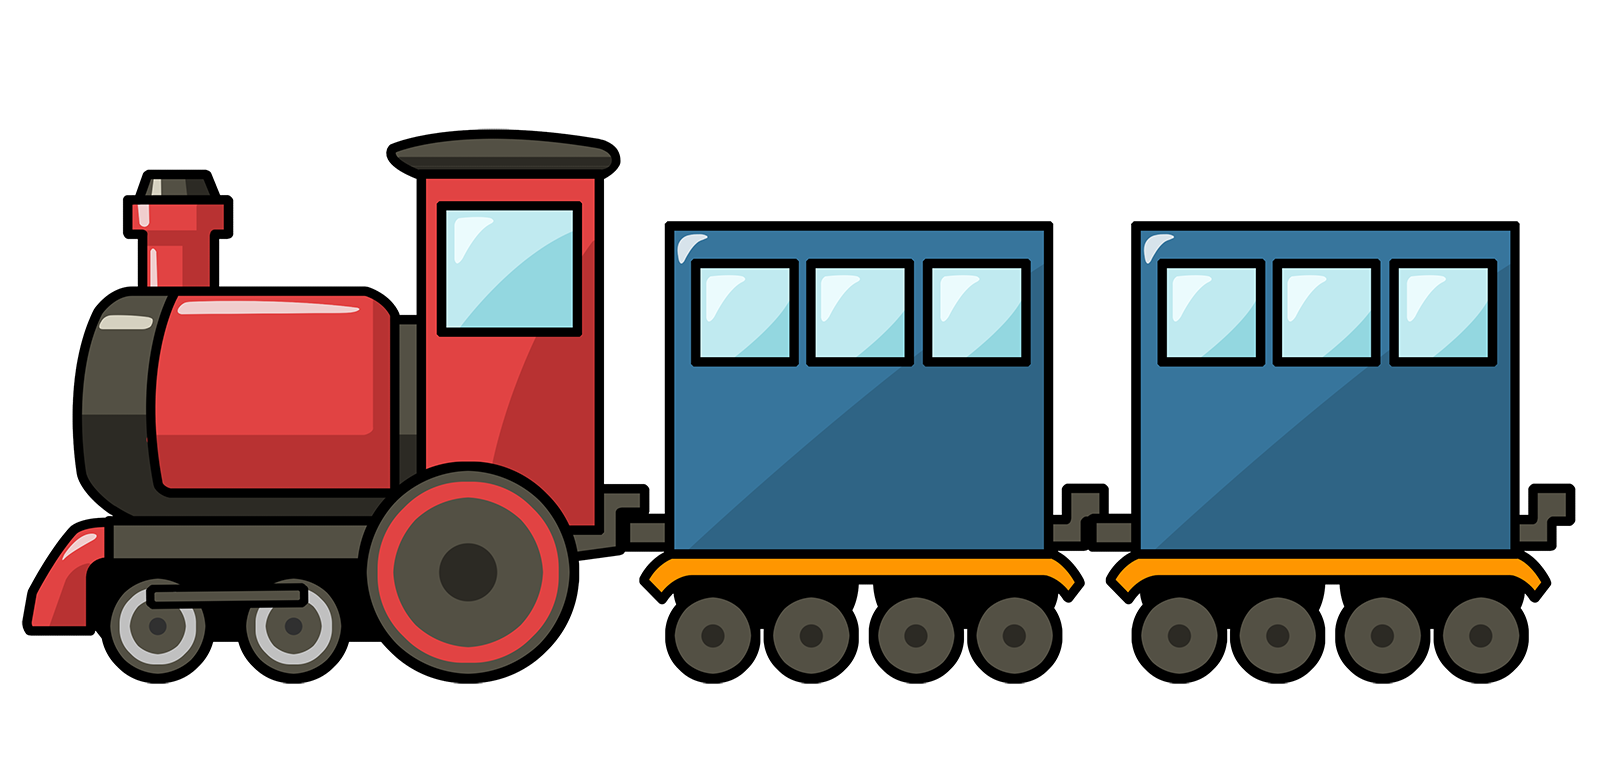 Cartoon Train | Free Cute Cartoon Train -Cartoon Train | Free Cute Cartoon Train Clip Art-0